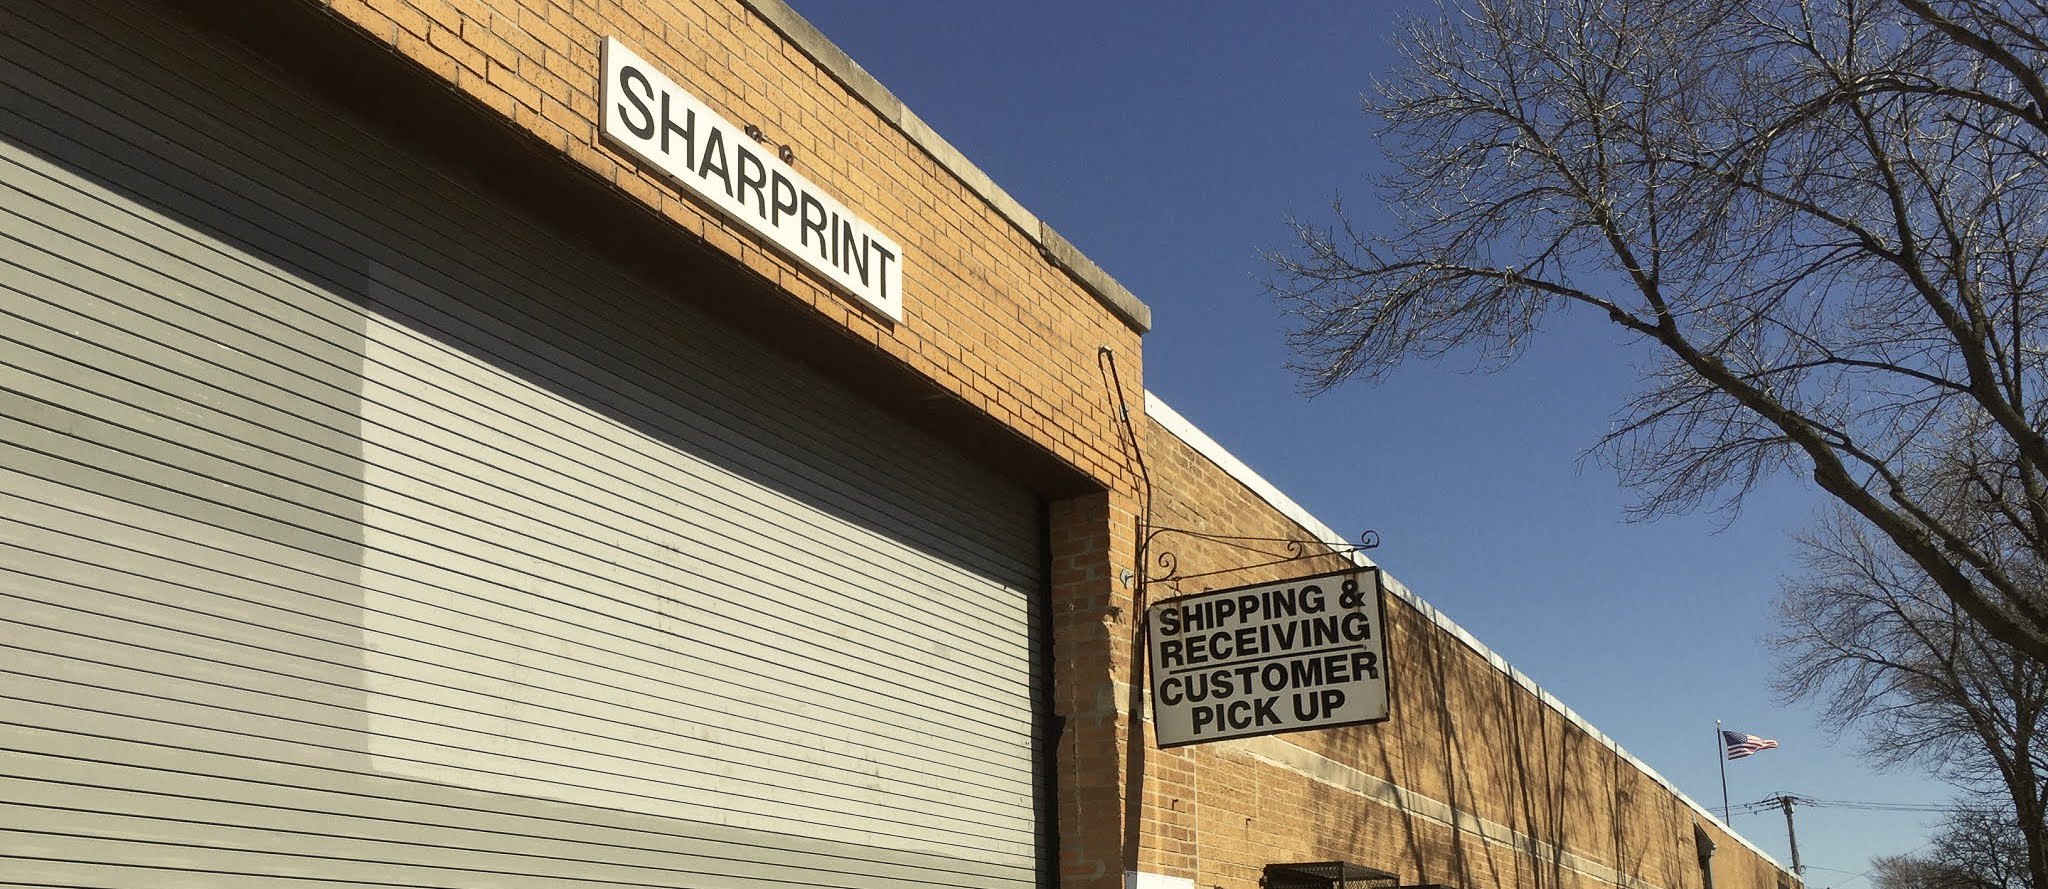 Shipping_Receiving_Sharprint_Chicago-2